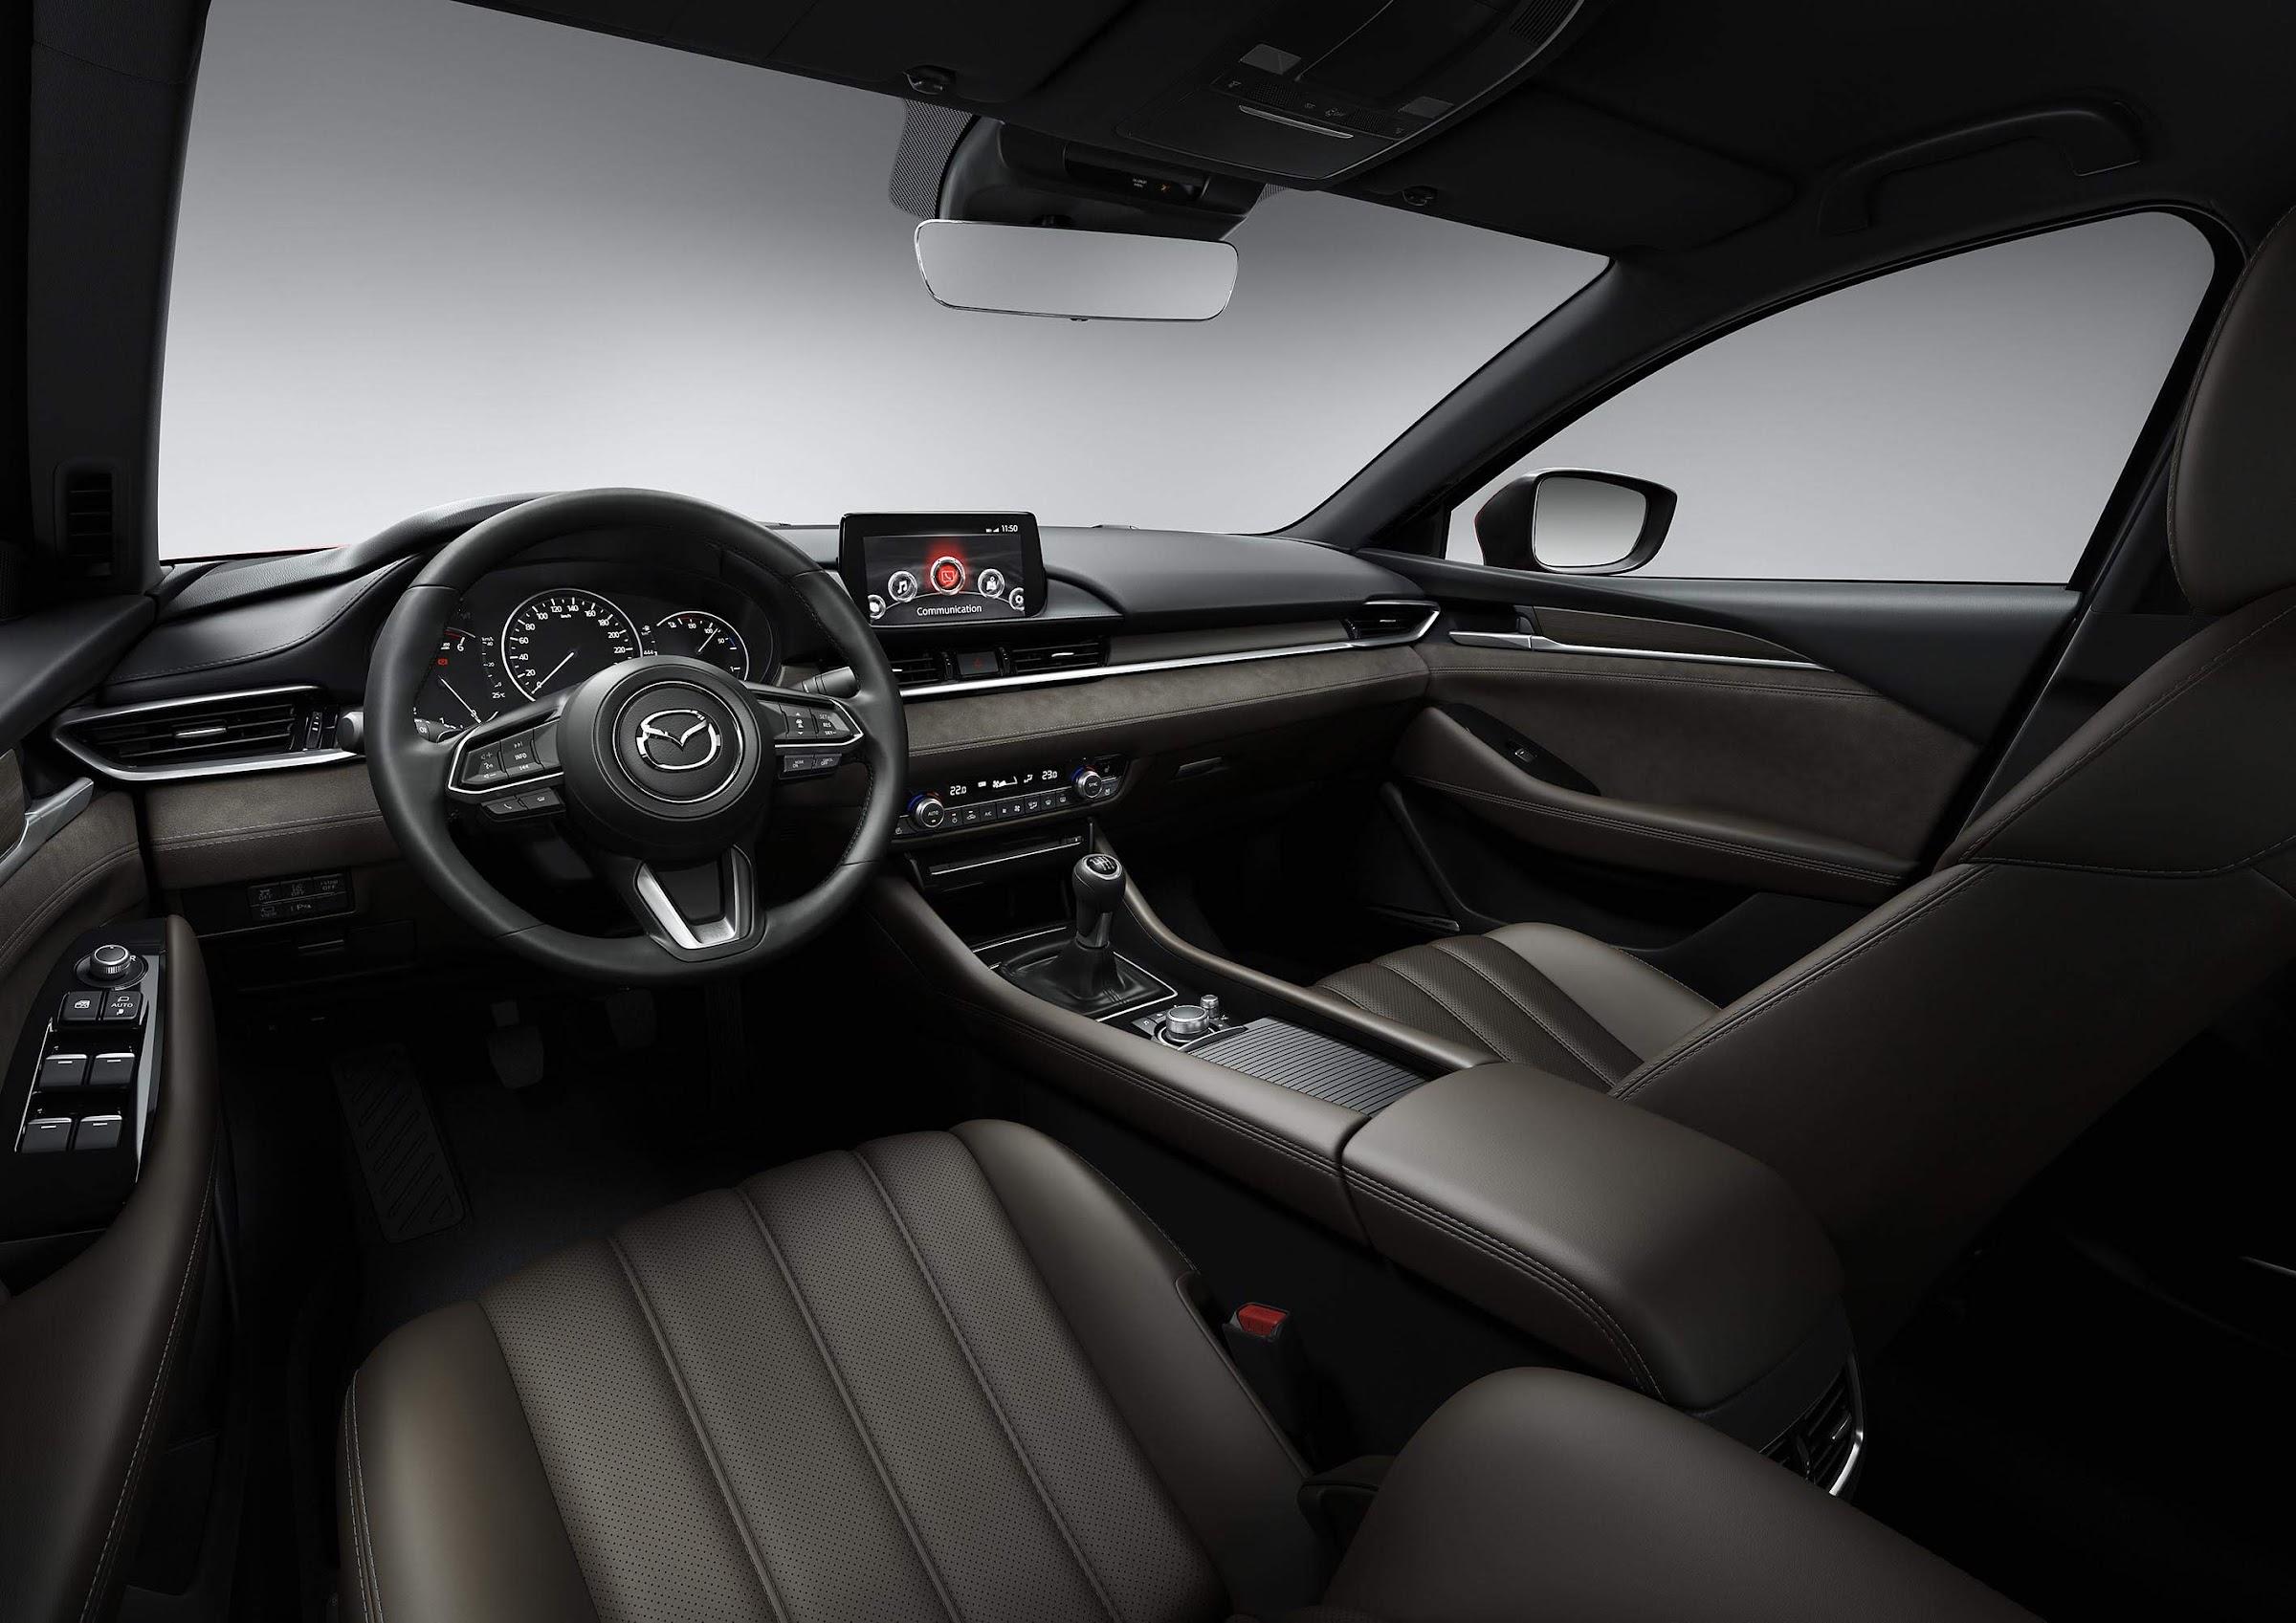 aBsd9slnjlYPveAuJBMV5HjAPkq lGToH6haYBRDY4bprNTgEzBfO PYkJQEFoMuwDrSCIjwox3mOhZCN5eju pe88P79z A3YugxRCvau9 TTfsoCOAMUadEla0rCA0 srQUoxLA=w2400 - Mazda presenta el Mazda6 Signature en Madrid Auto 2018